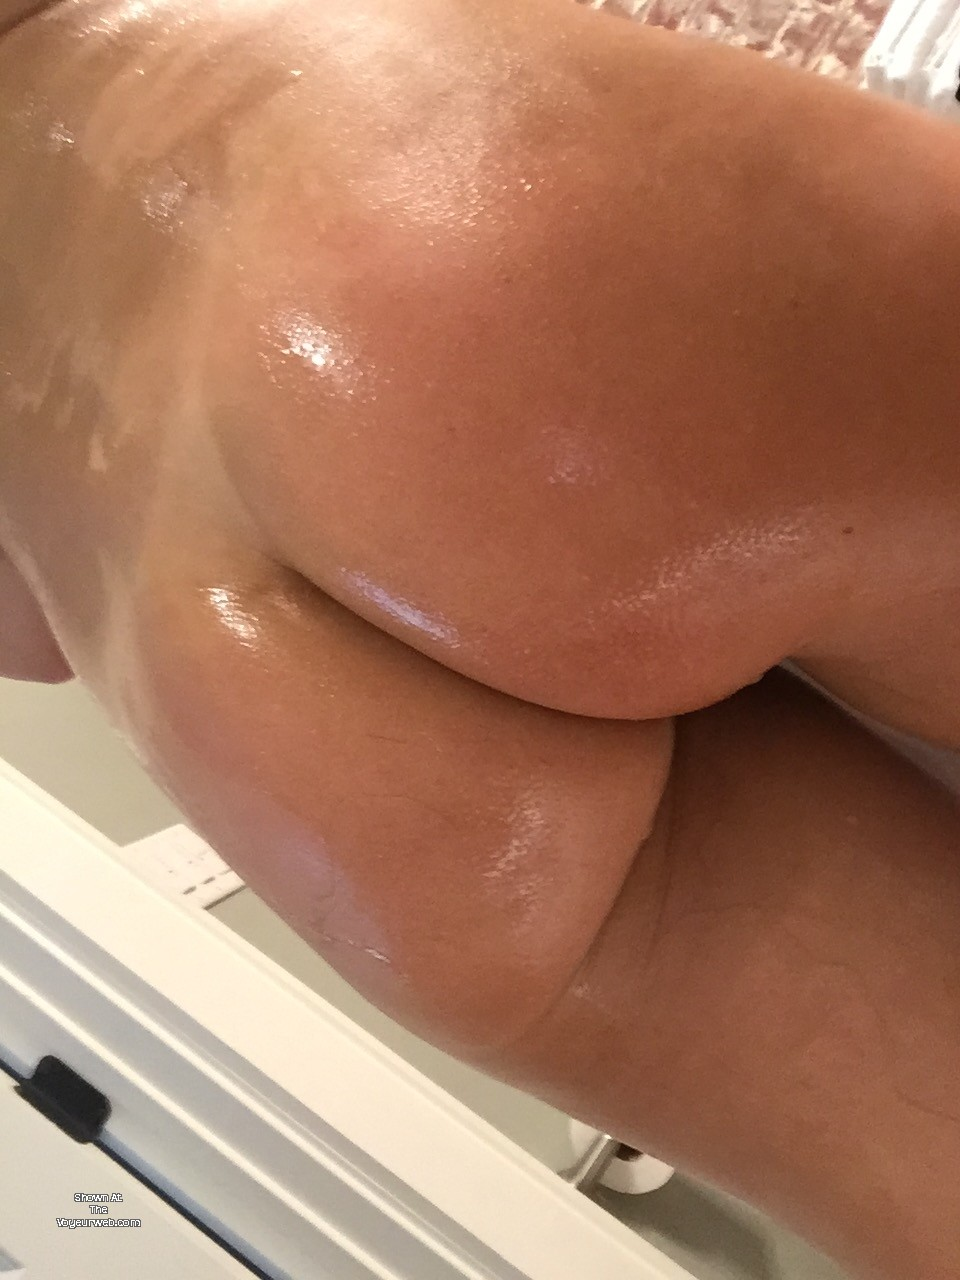 Pic #1My girlfriend's ass - renee